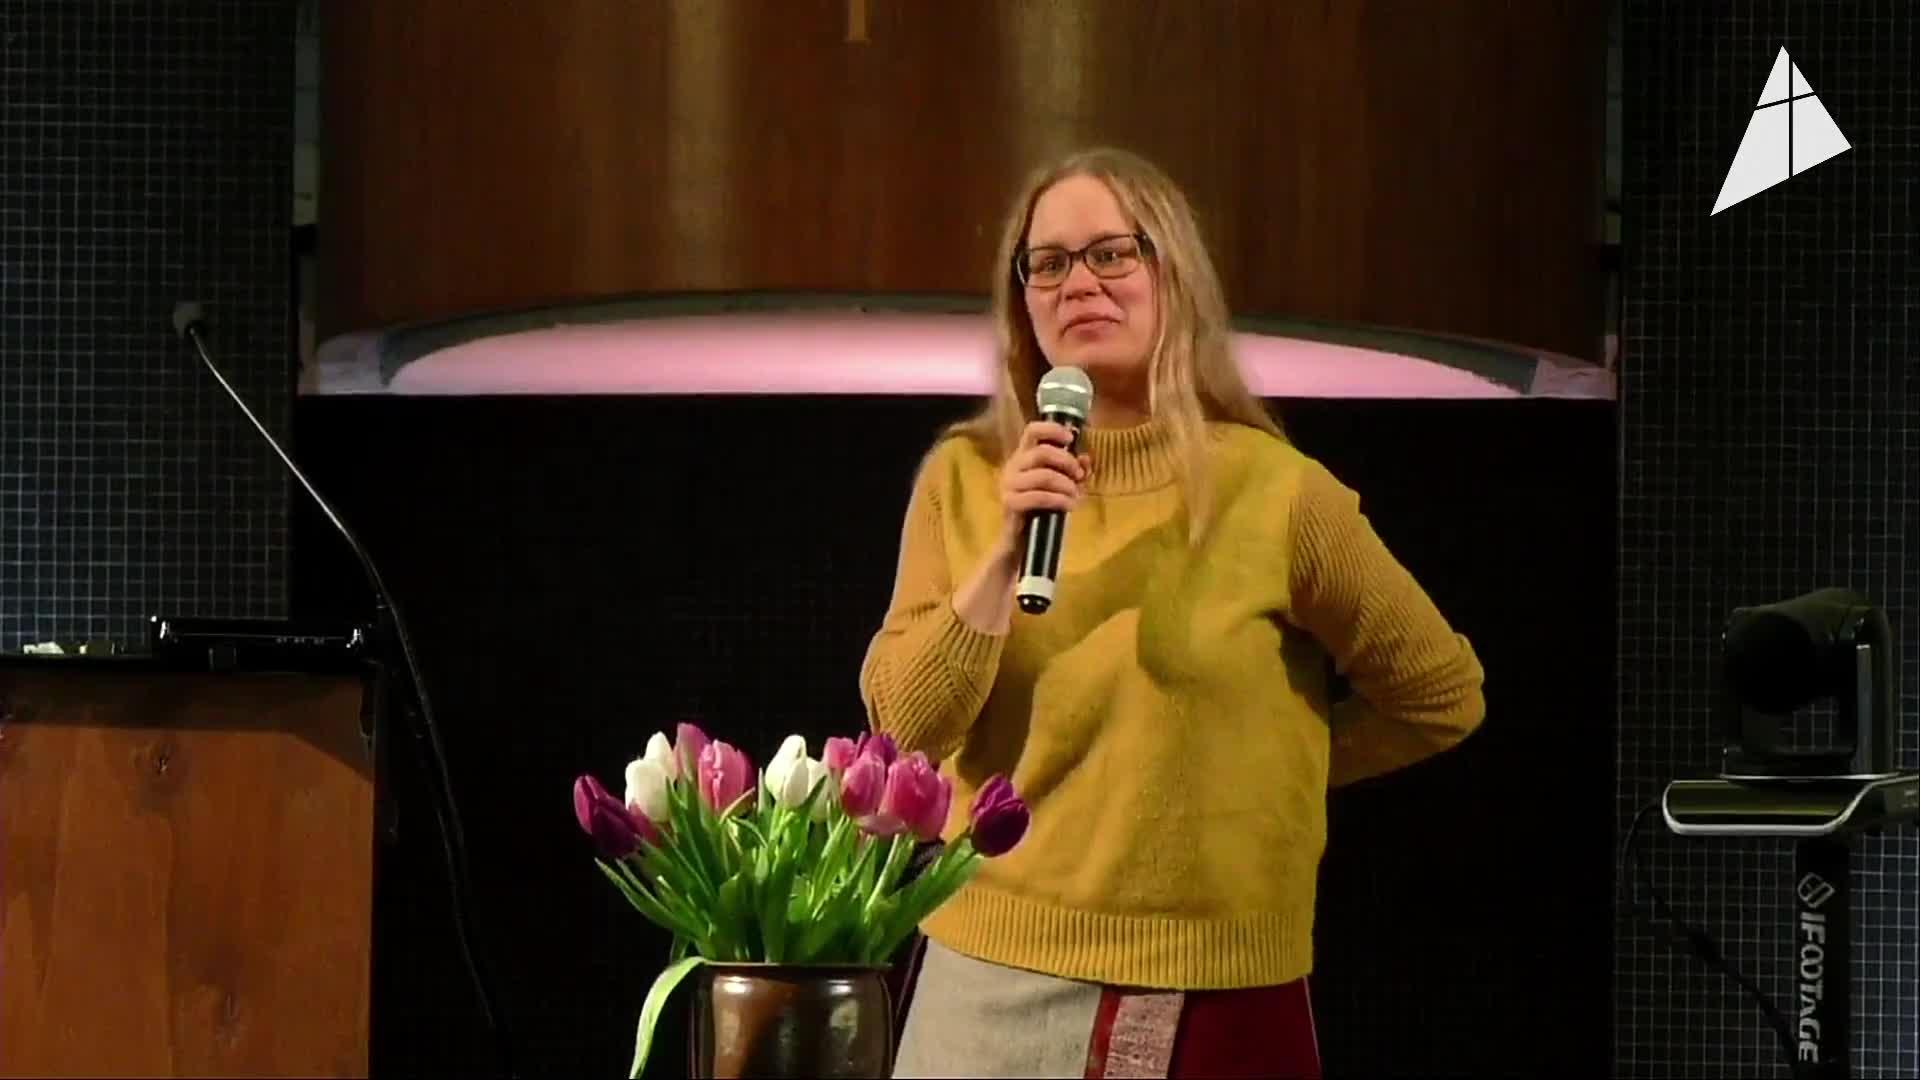 Gottesdienst am 24. Januar 2021 - Livestream aus der Christuskirche Altona